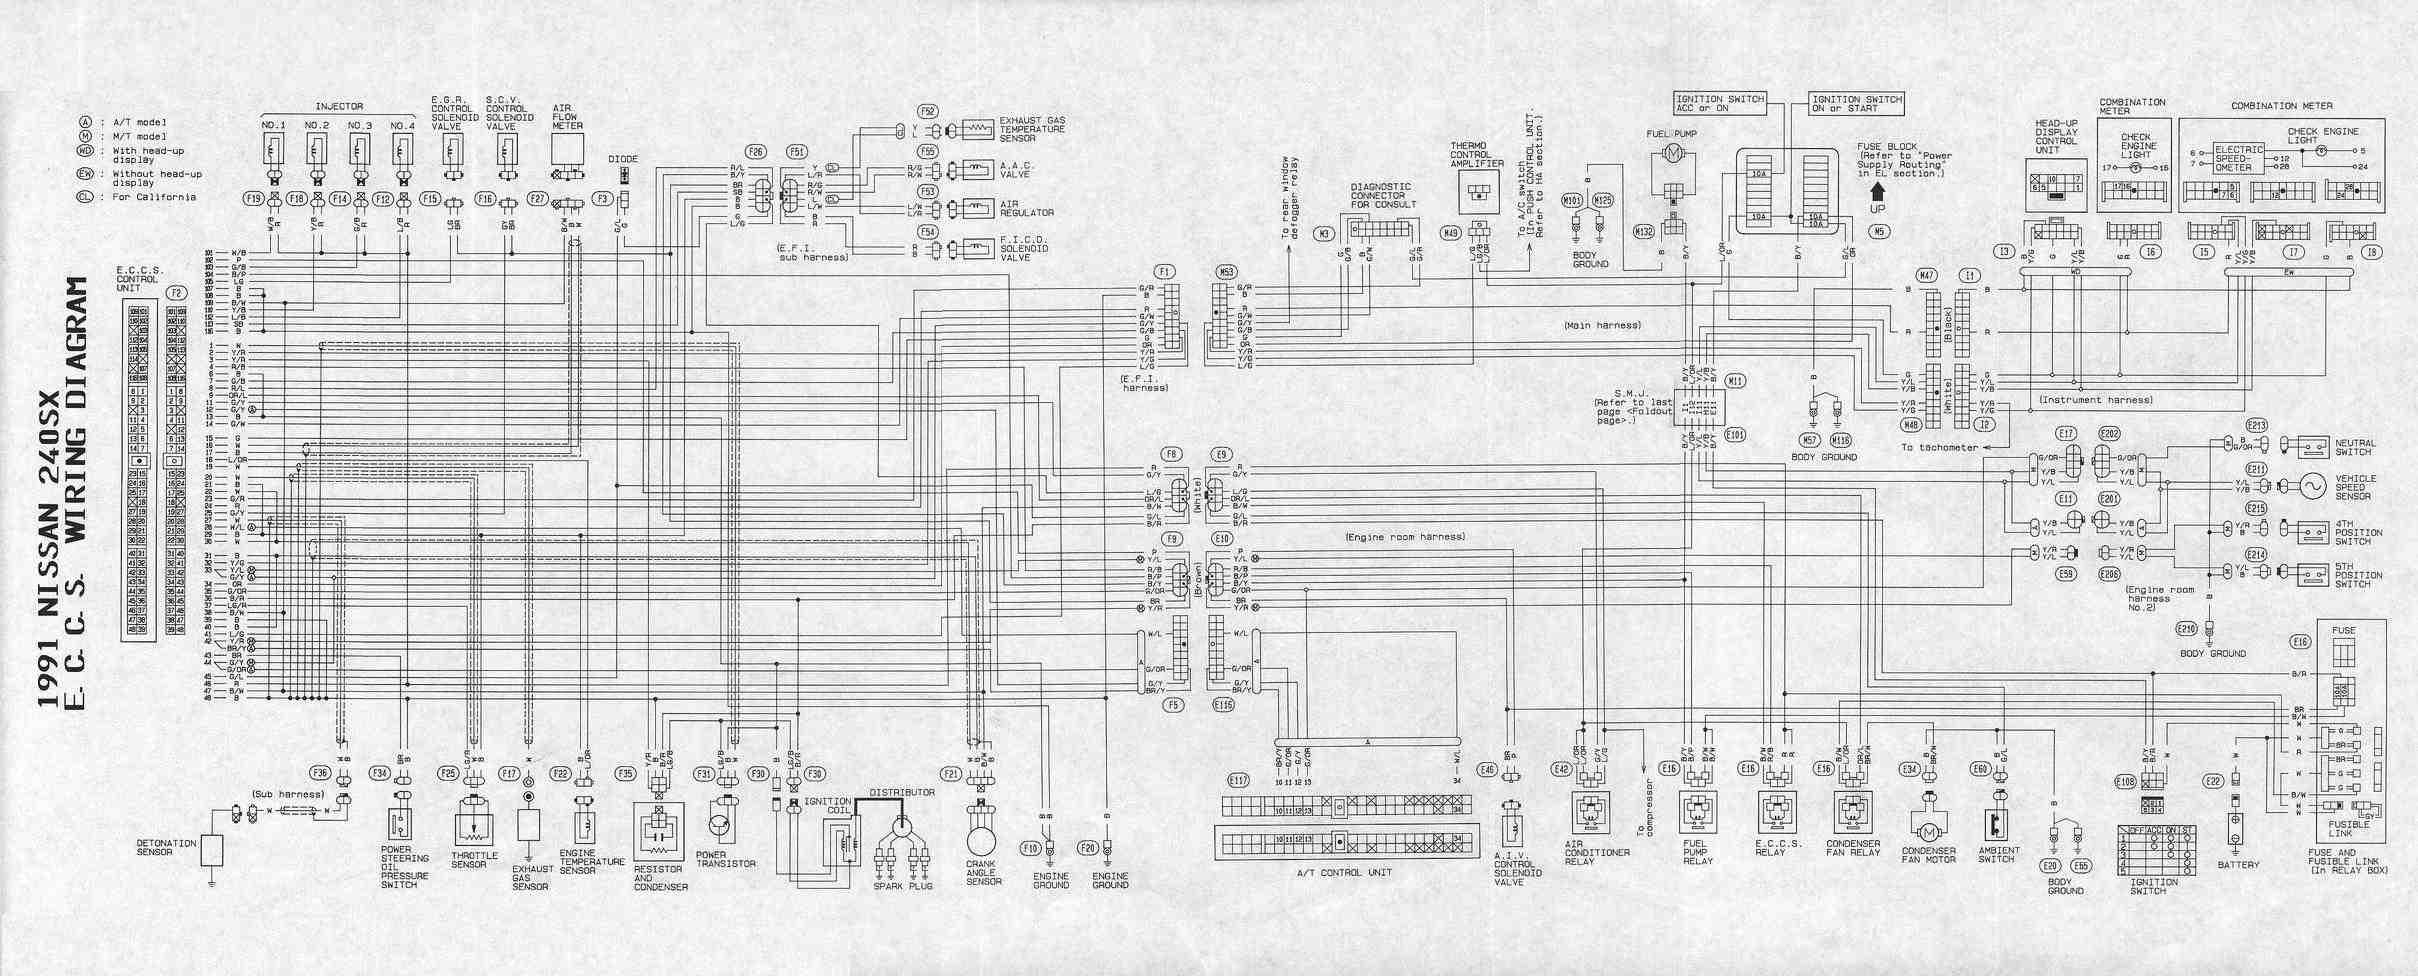 medium resolution of nissan ka24e wiring diagram wiring diagram schematics source rb20det wiring diagram pdf free u2022 oasis